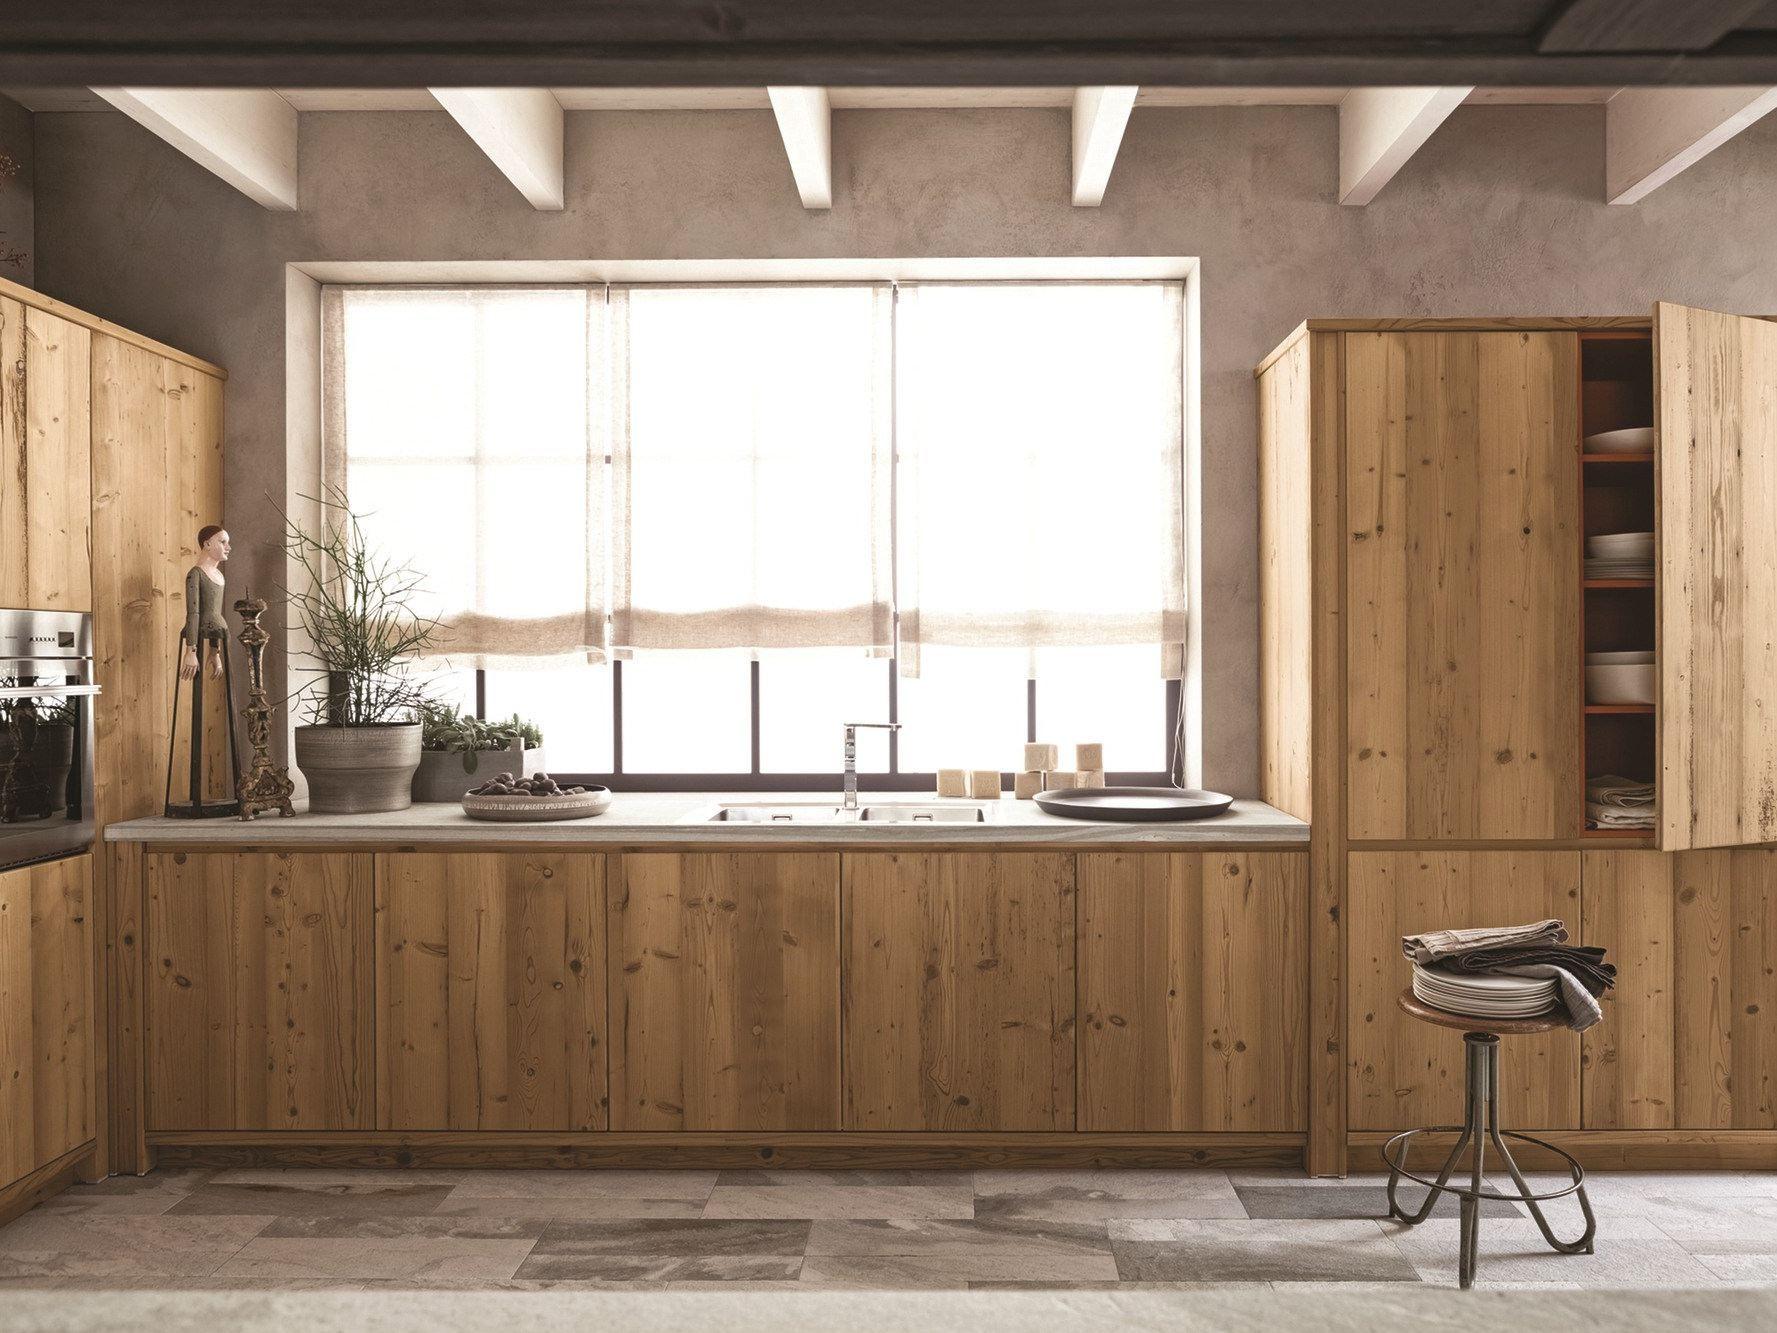 Cucina in abete ardesia con penisola maestrale 03 by - Cucine in abete ...